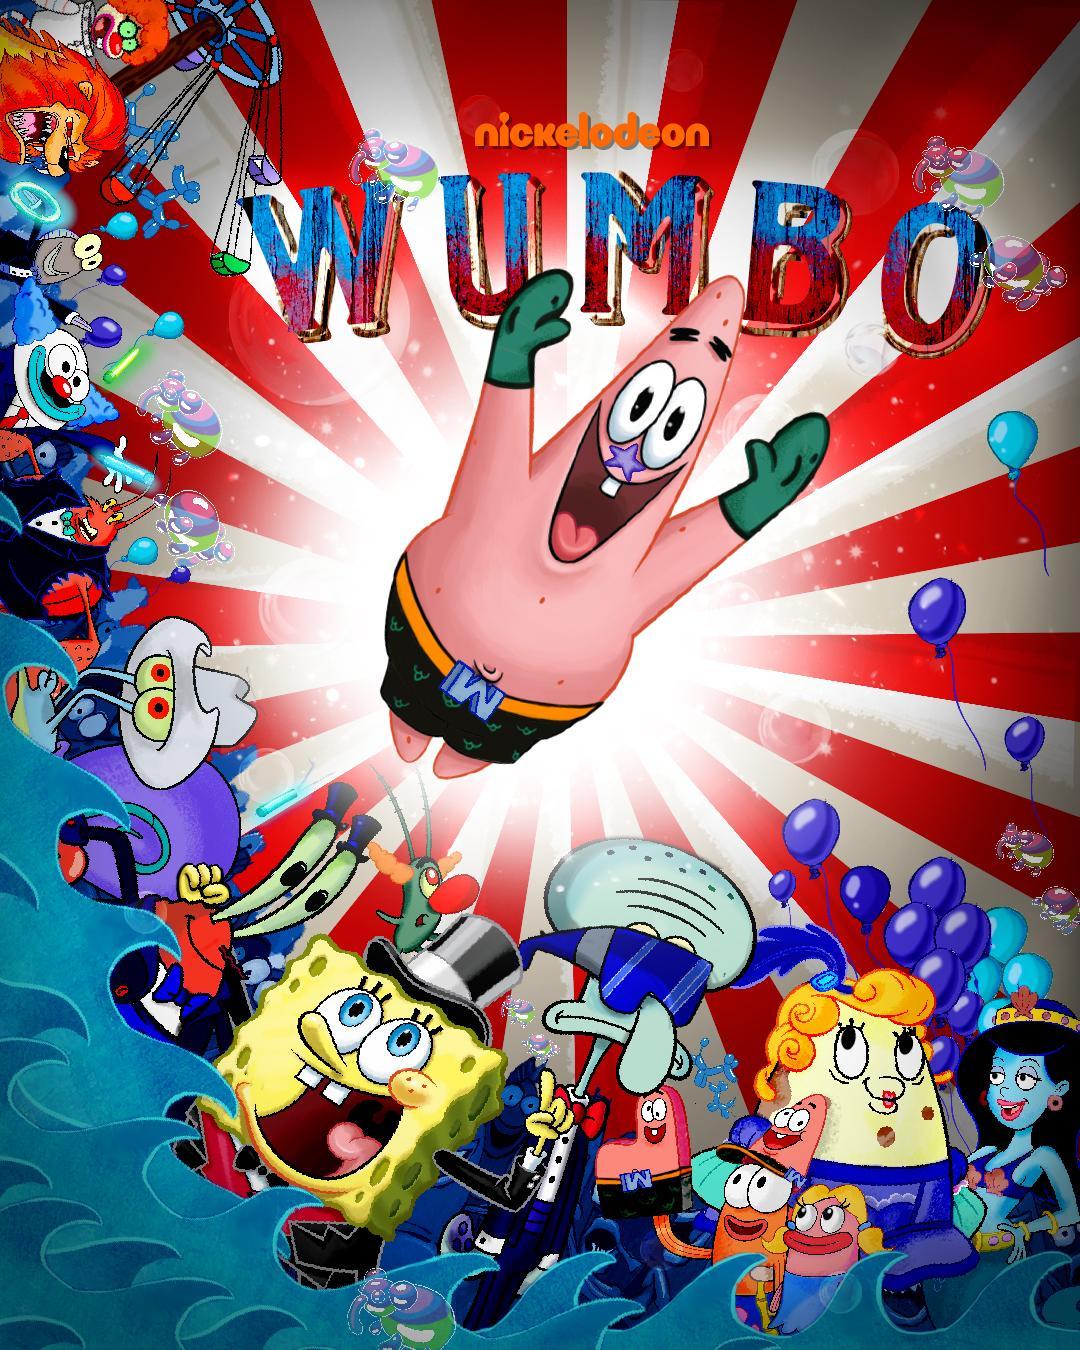 Spongebob Hiccup Plague : spongebob, hiccup, plague, SpongeBob, Twitter:, Beloved, Depths…